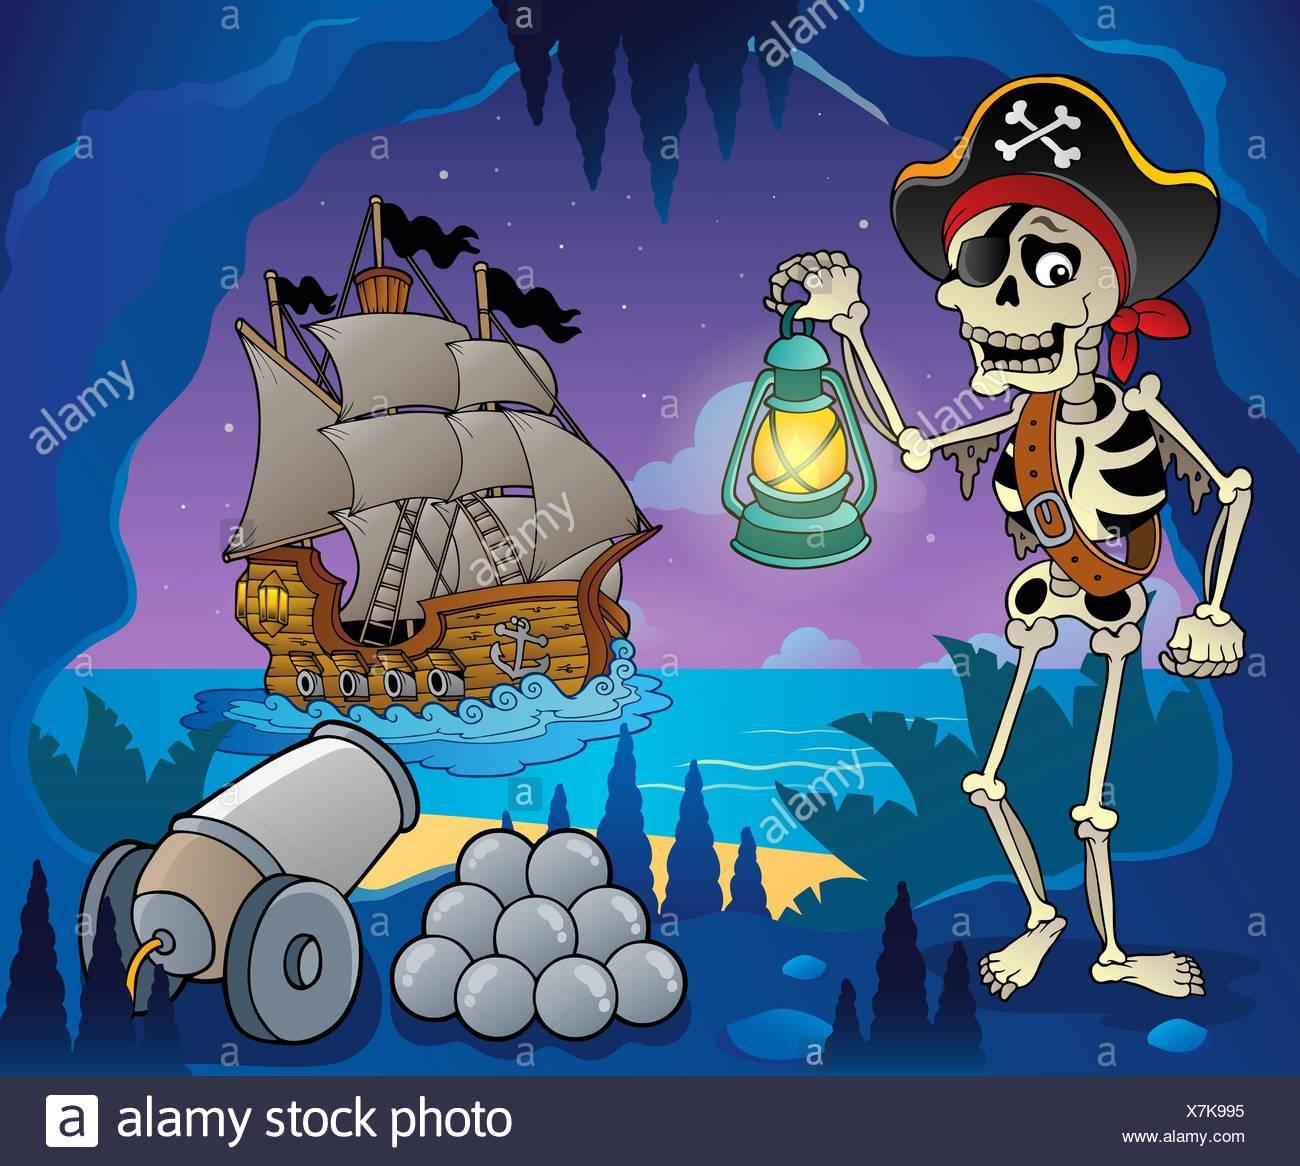 Pirate Cove Thema Bild 6 - Bild-Darstellung. Stockbild